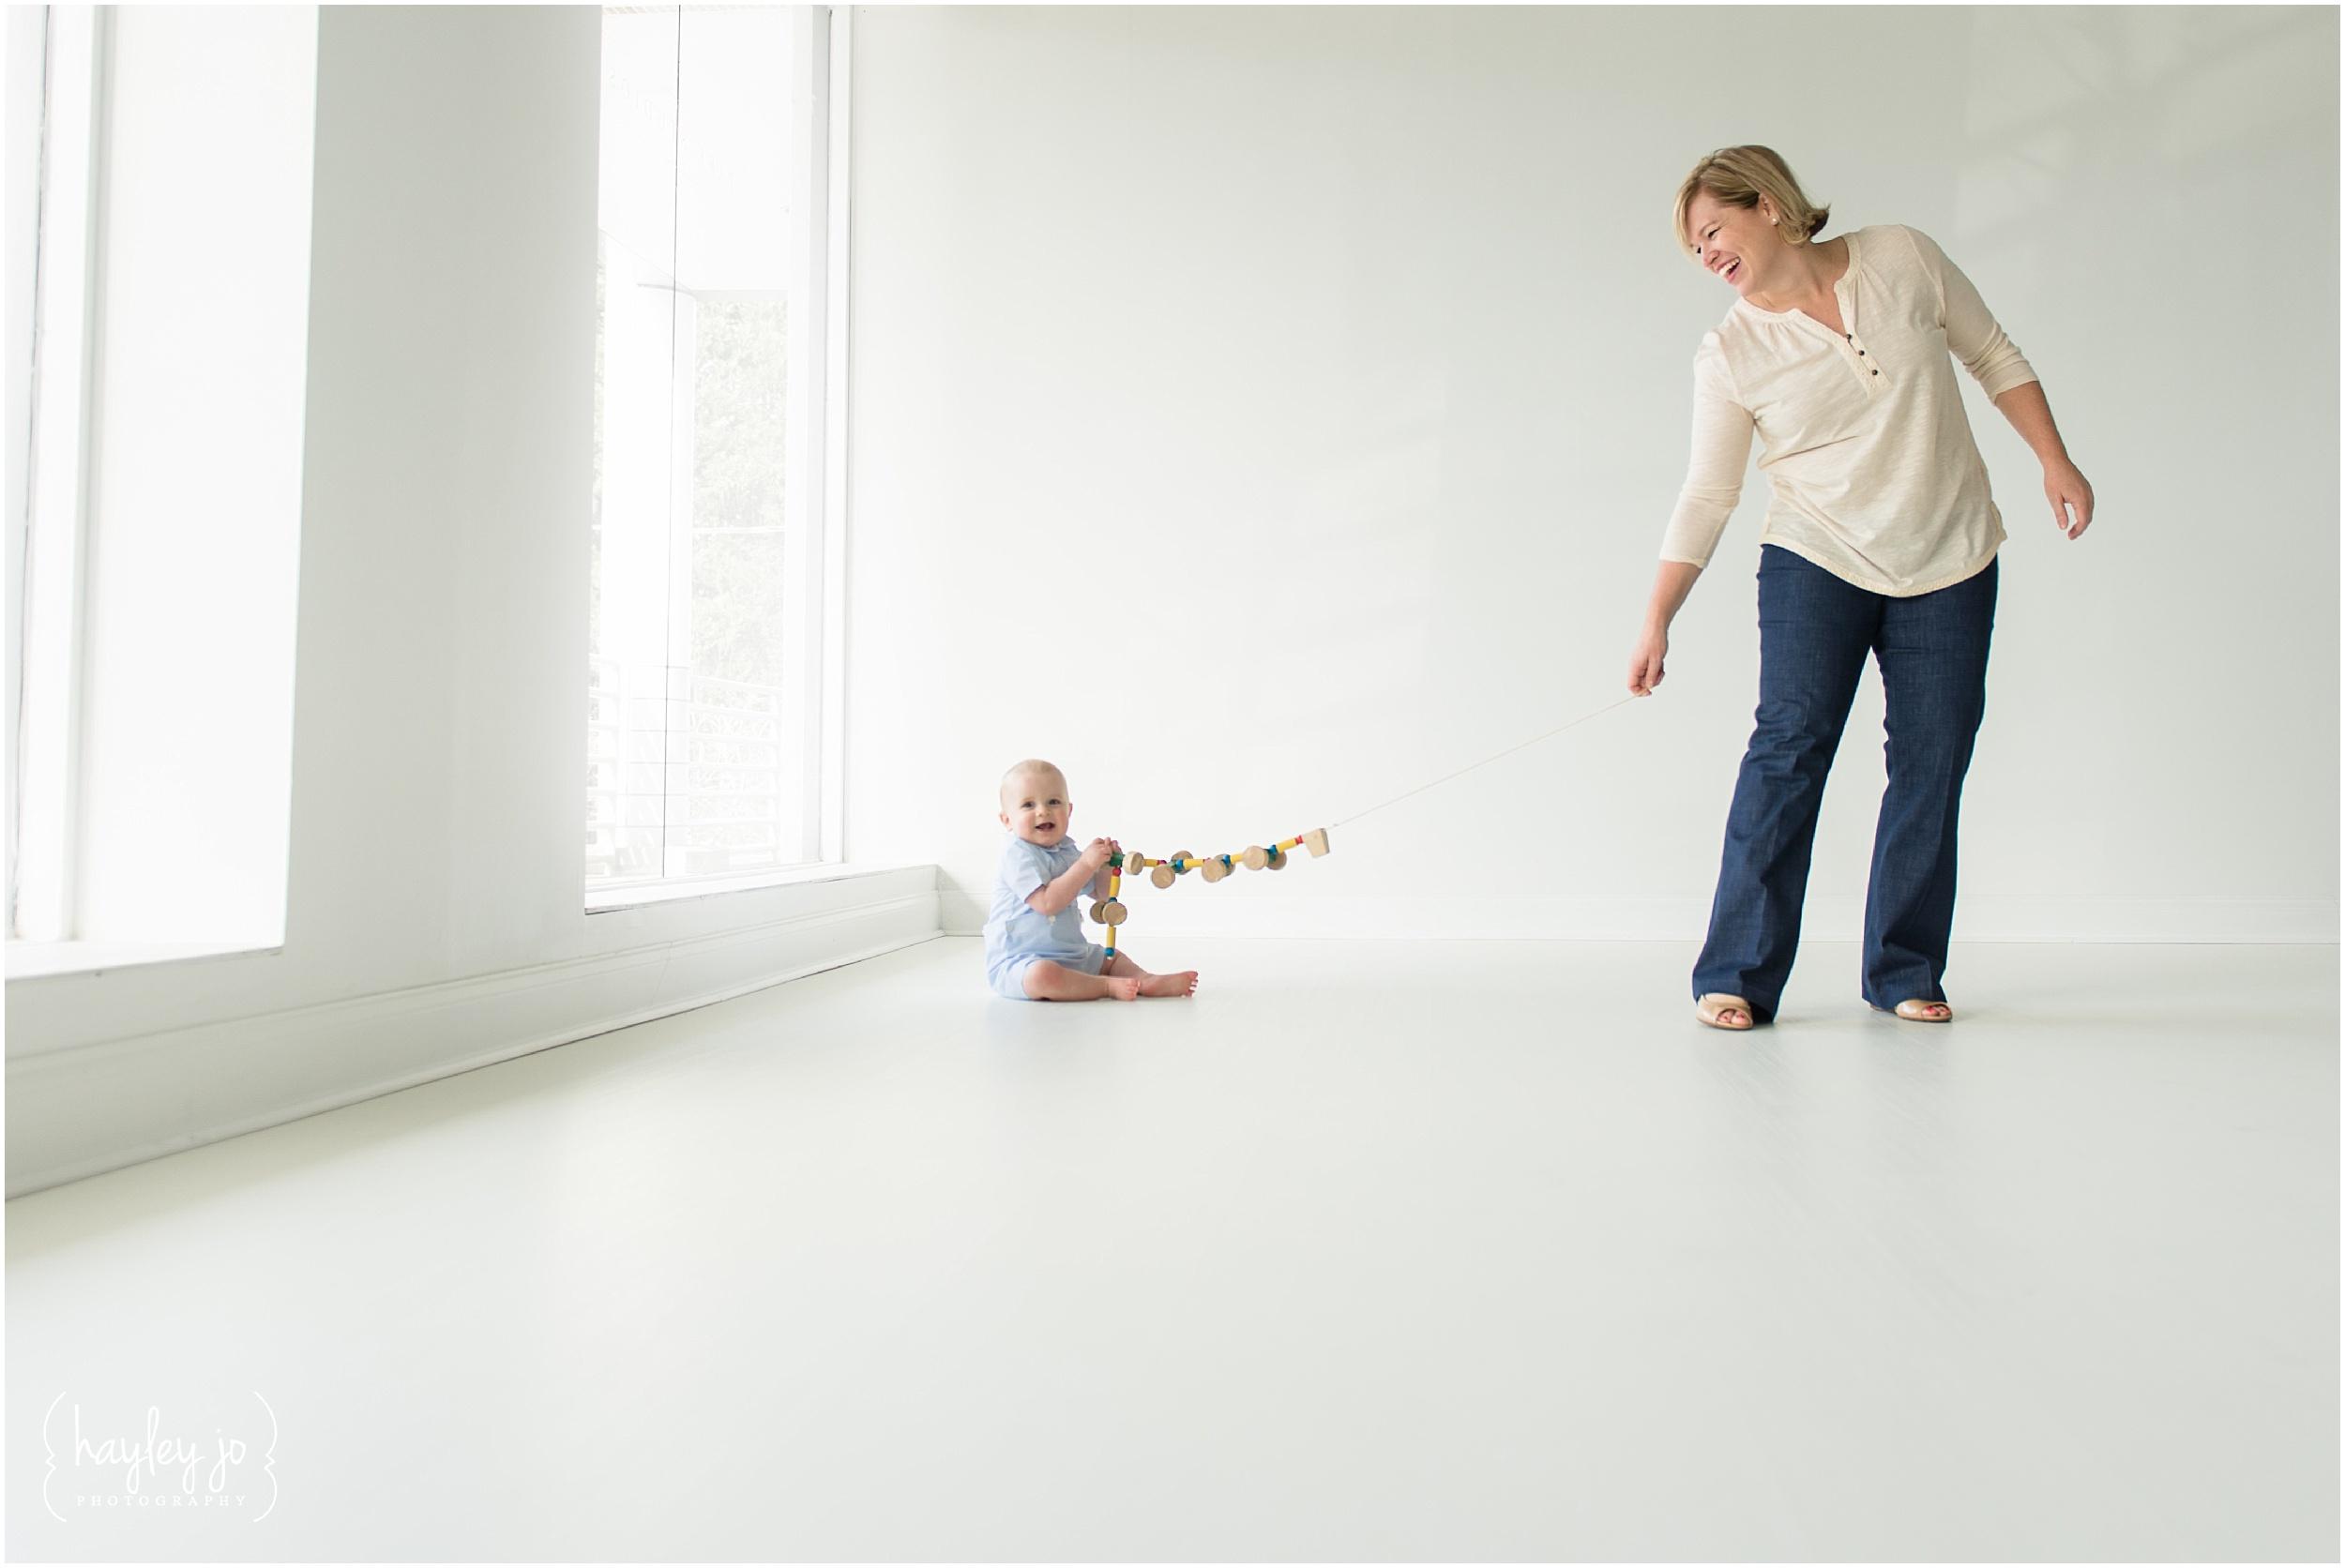 atlanta-newborn-photographer-hayley-jo-photography-atlanta-family-photographer_0094.jpg